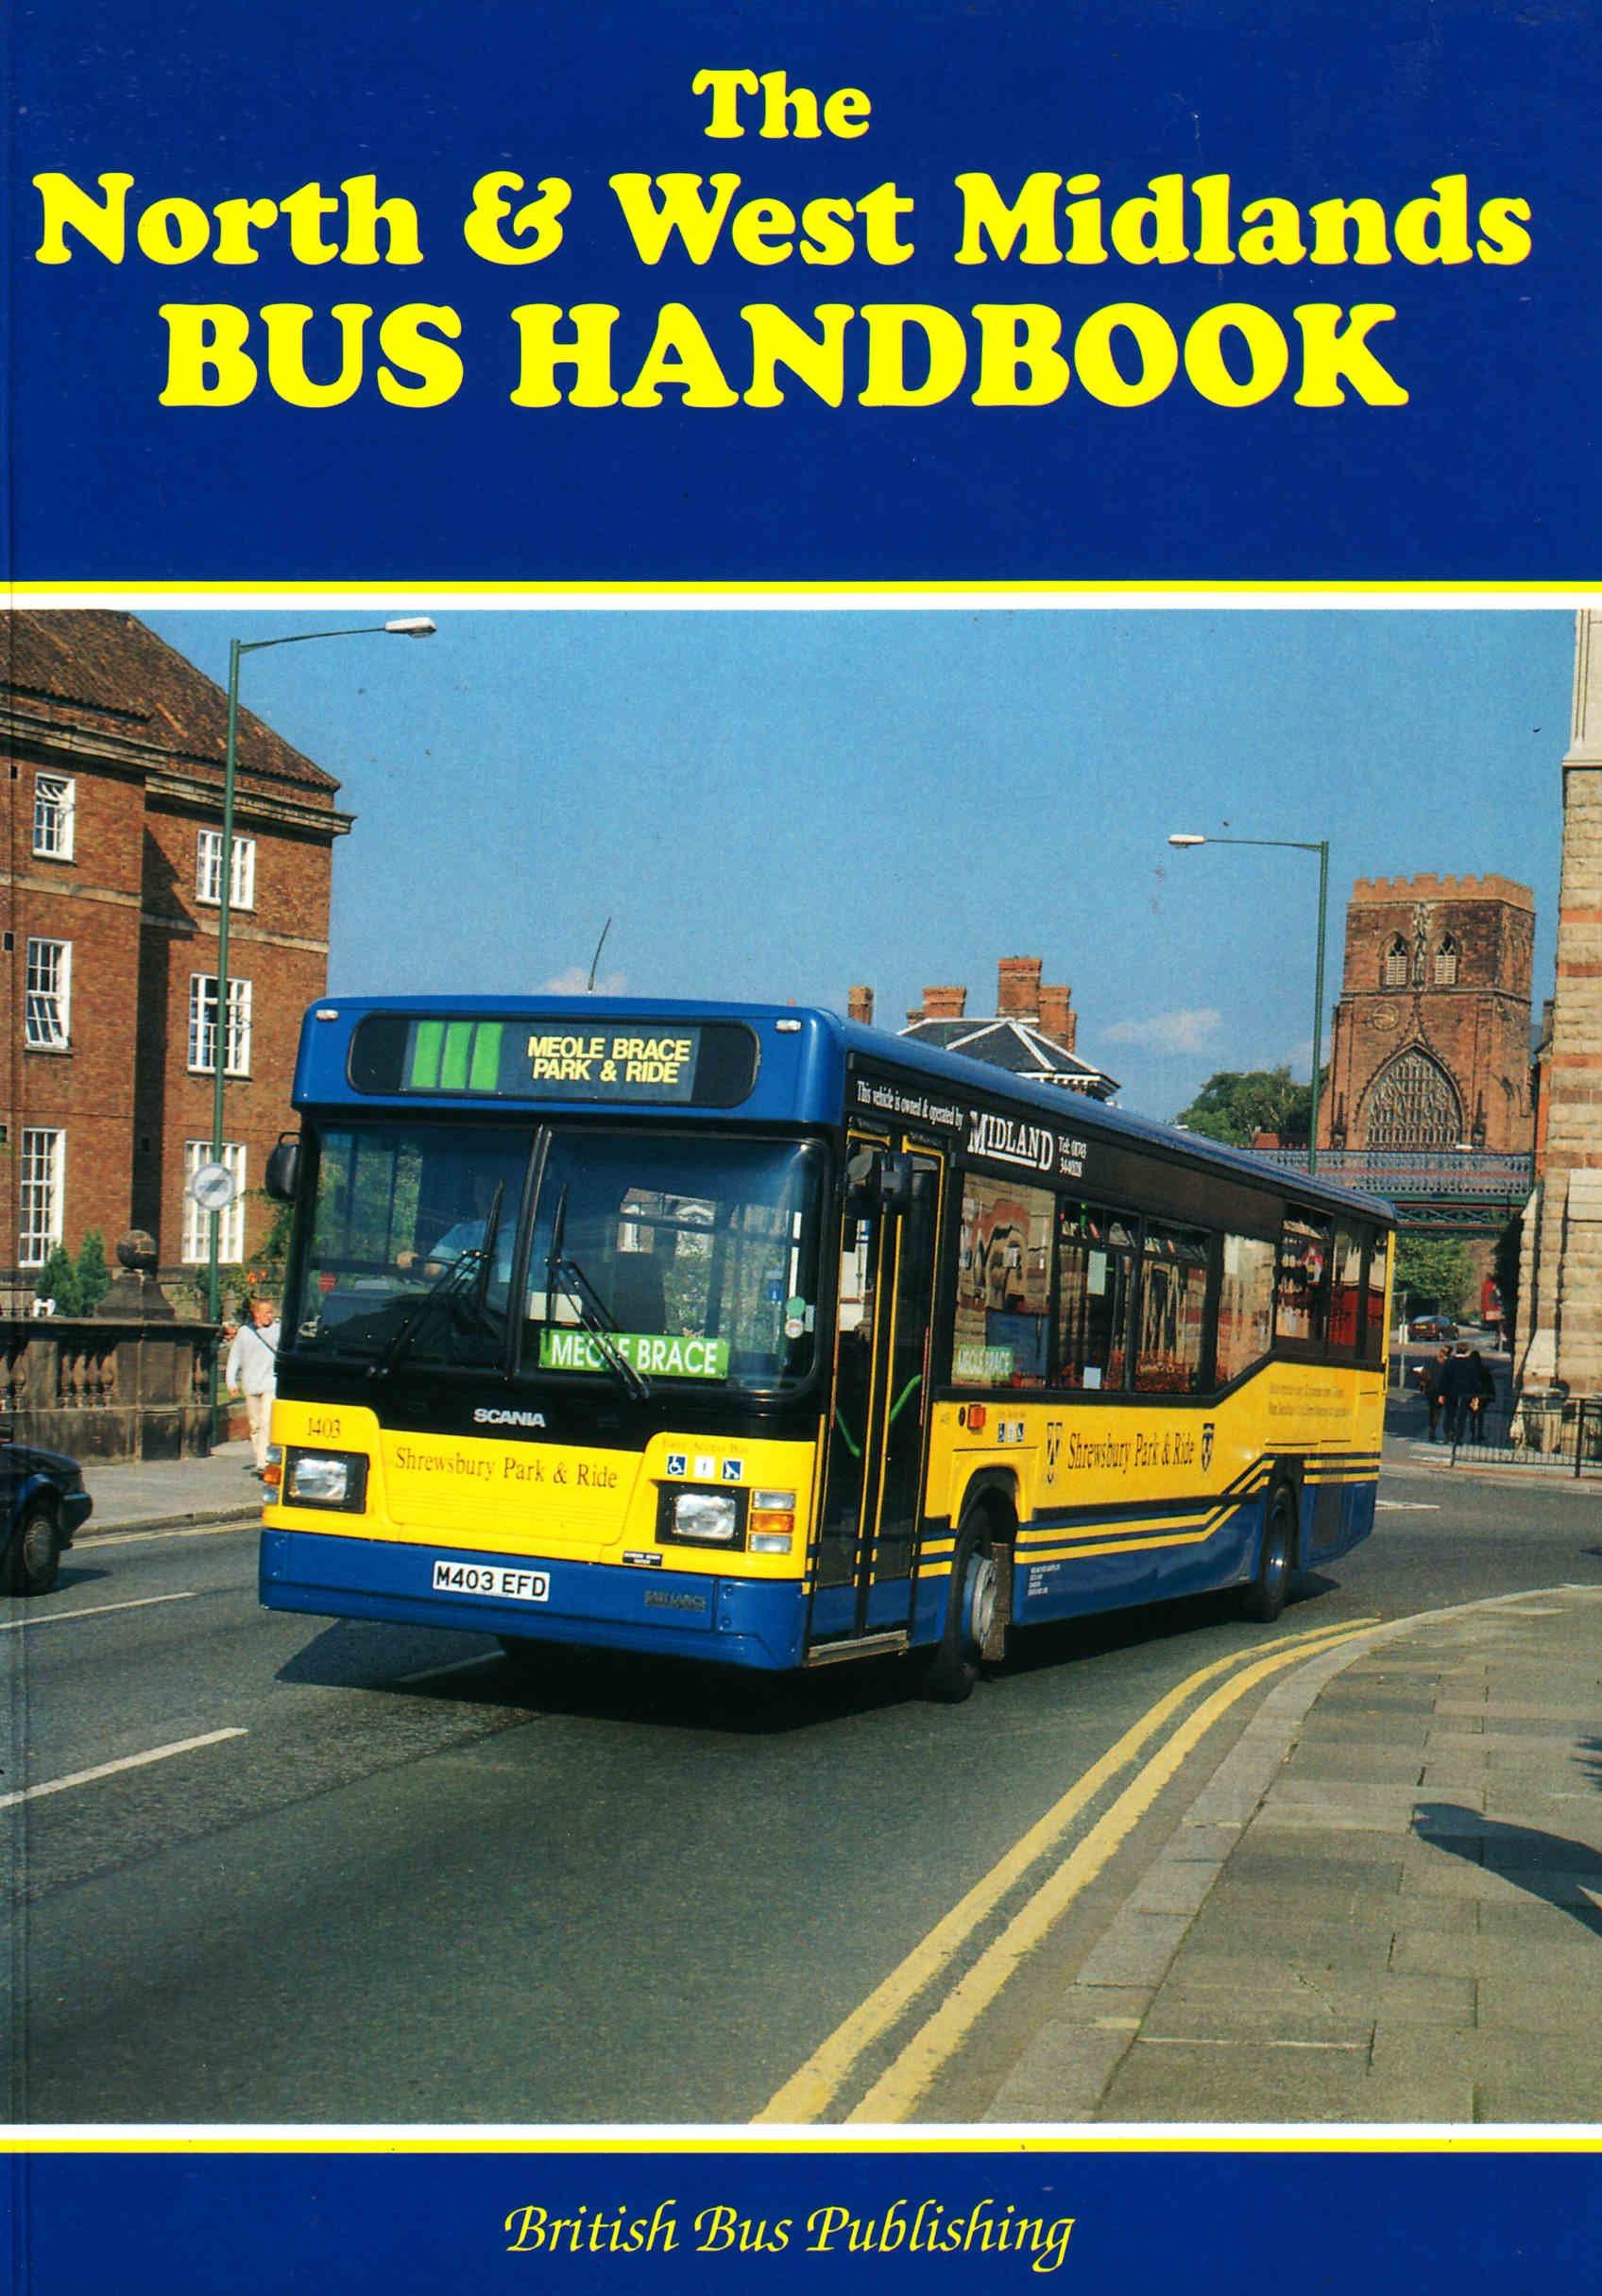 The North and West Midlands Bus Handbook